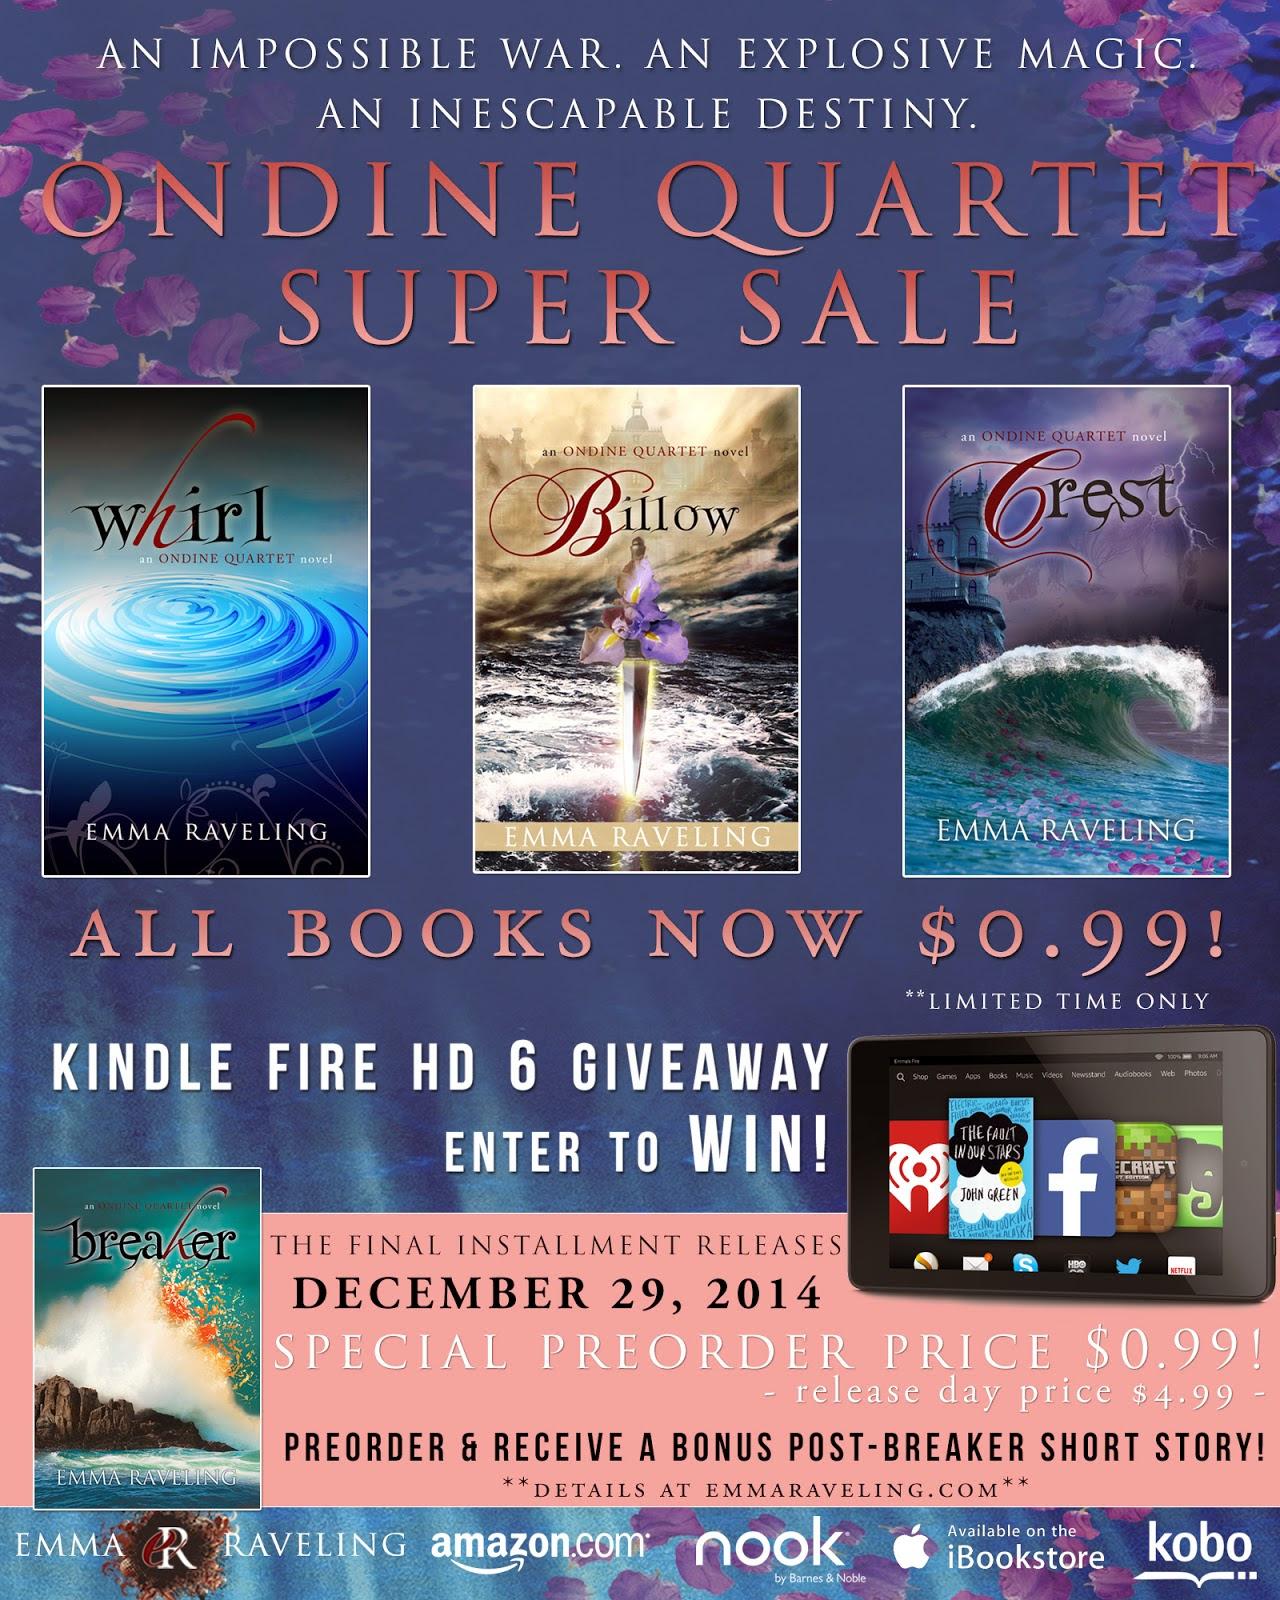 Ondine Quartet Sale + Kindle Fire HD 6 Giveaway!!!